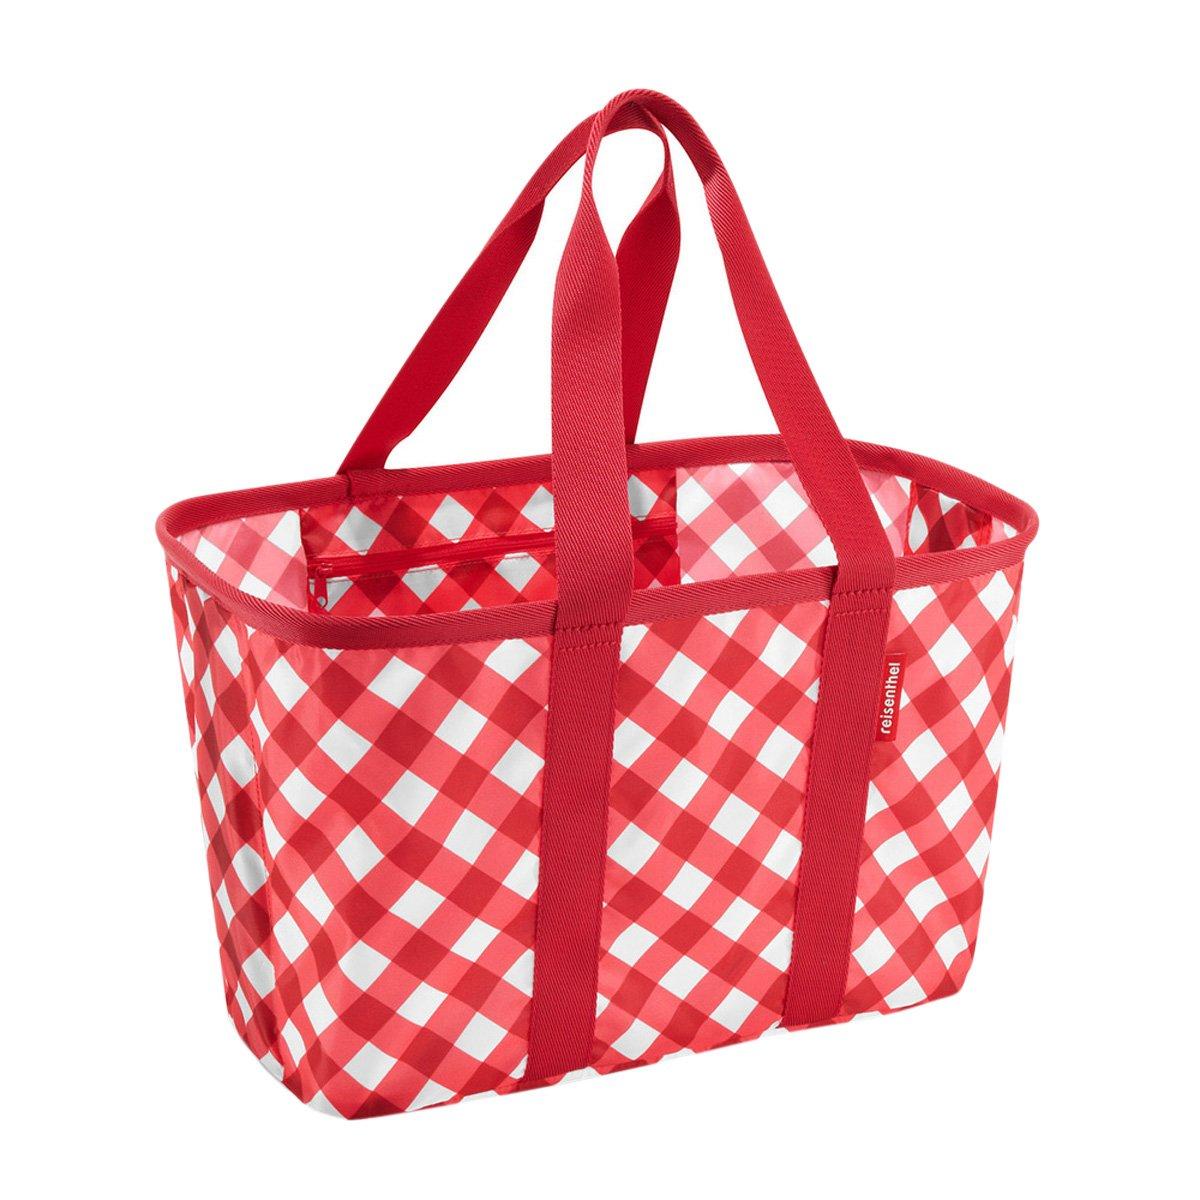 Reisenthel Mini Maxi Basket Strandtasche, 47 cm, 30 L, Millefleurs BV6038